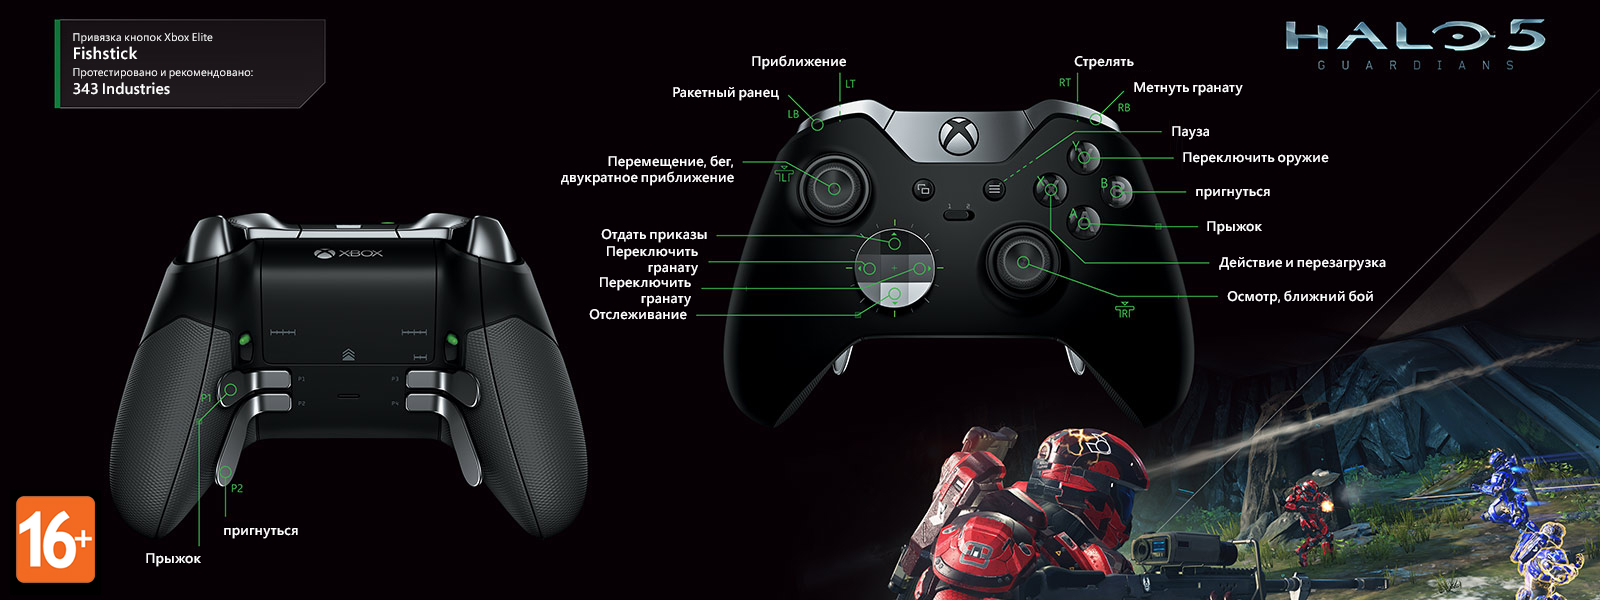 Halo 5 — раскладка Fishstick под геймпад Elite